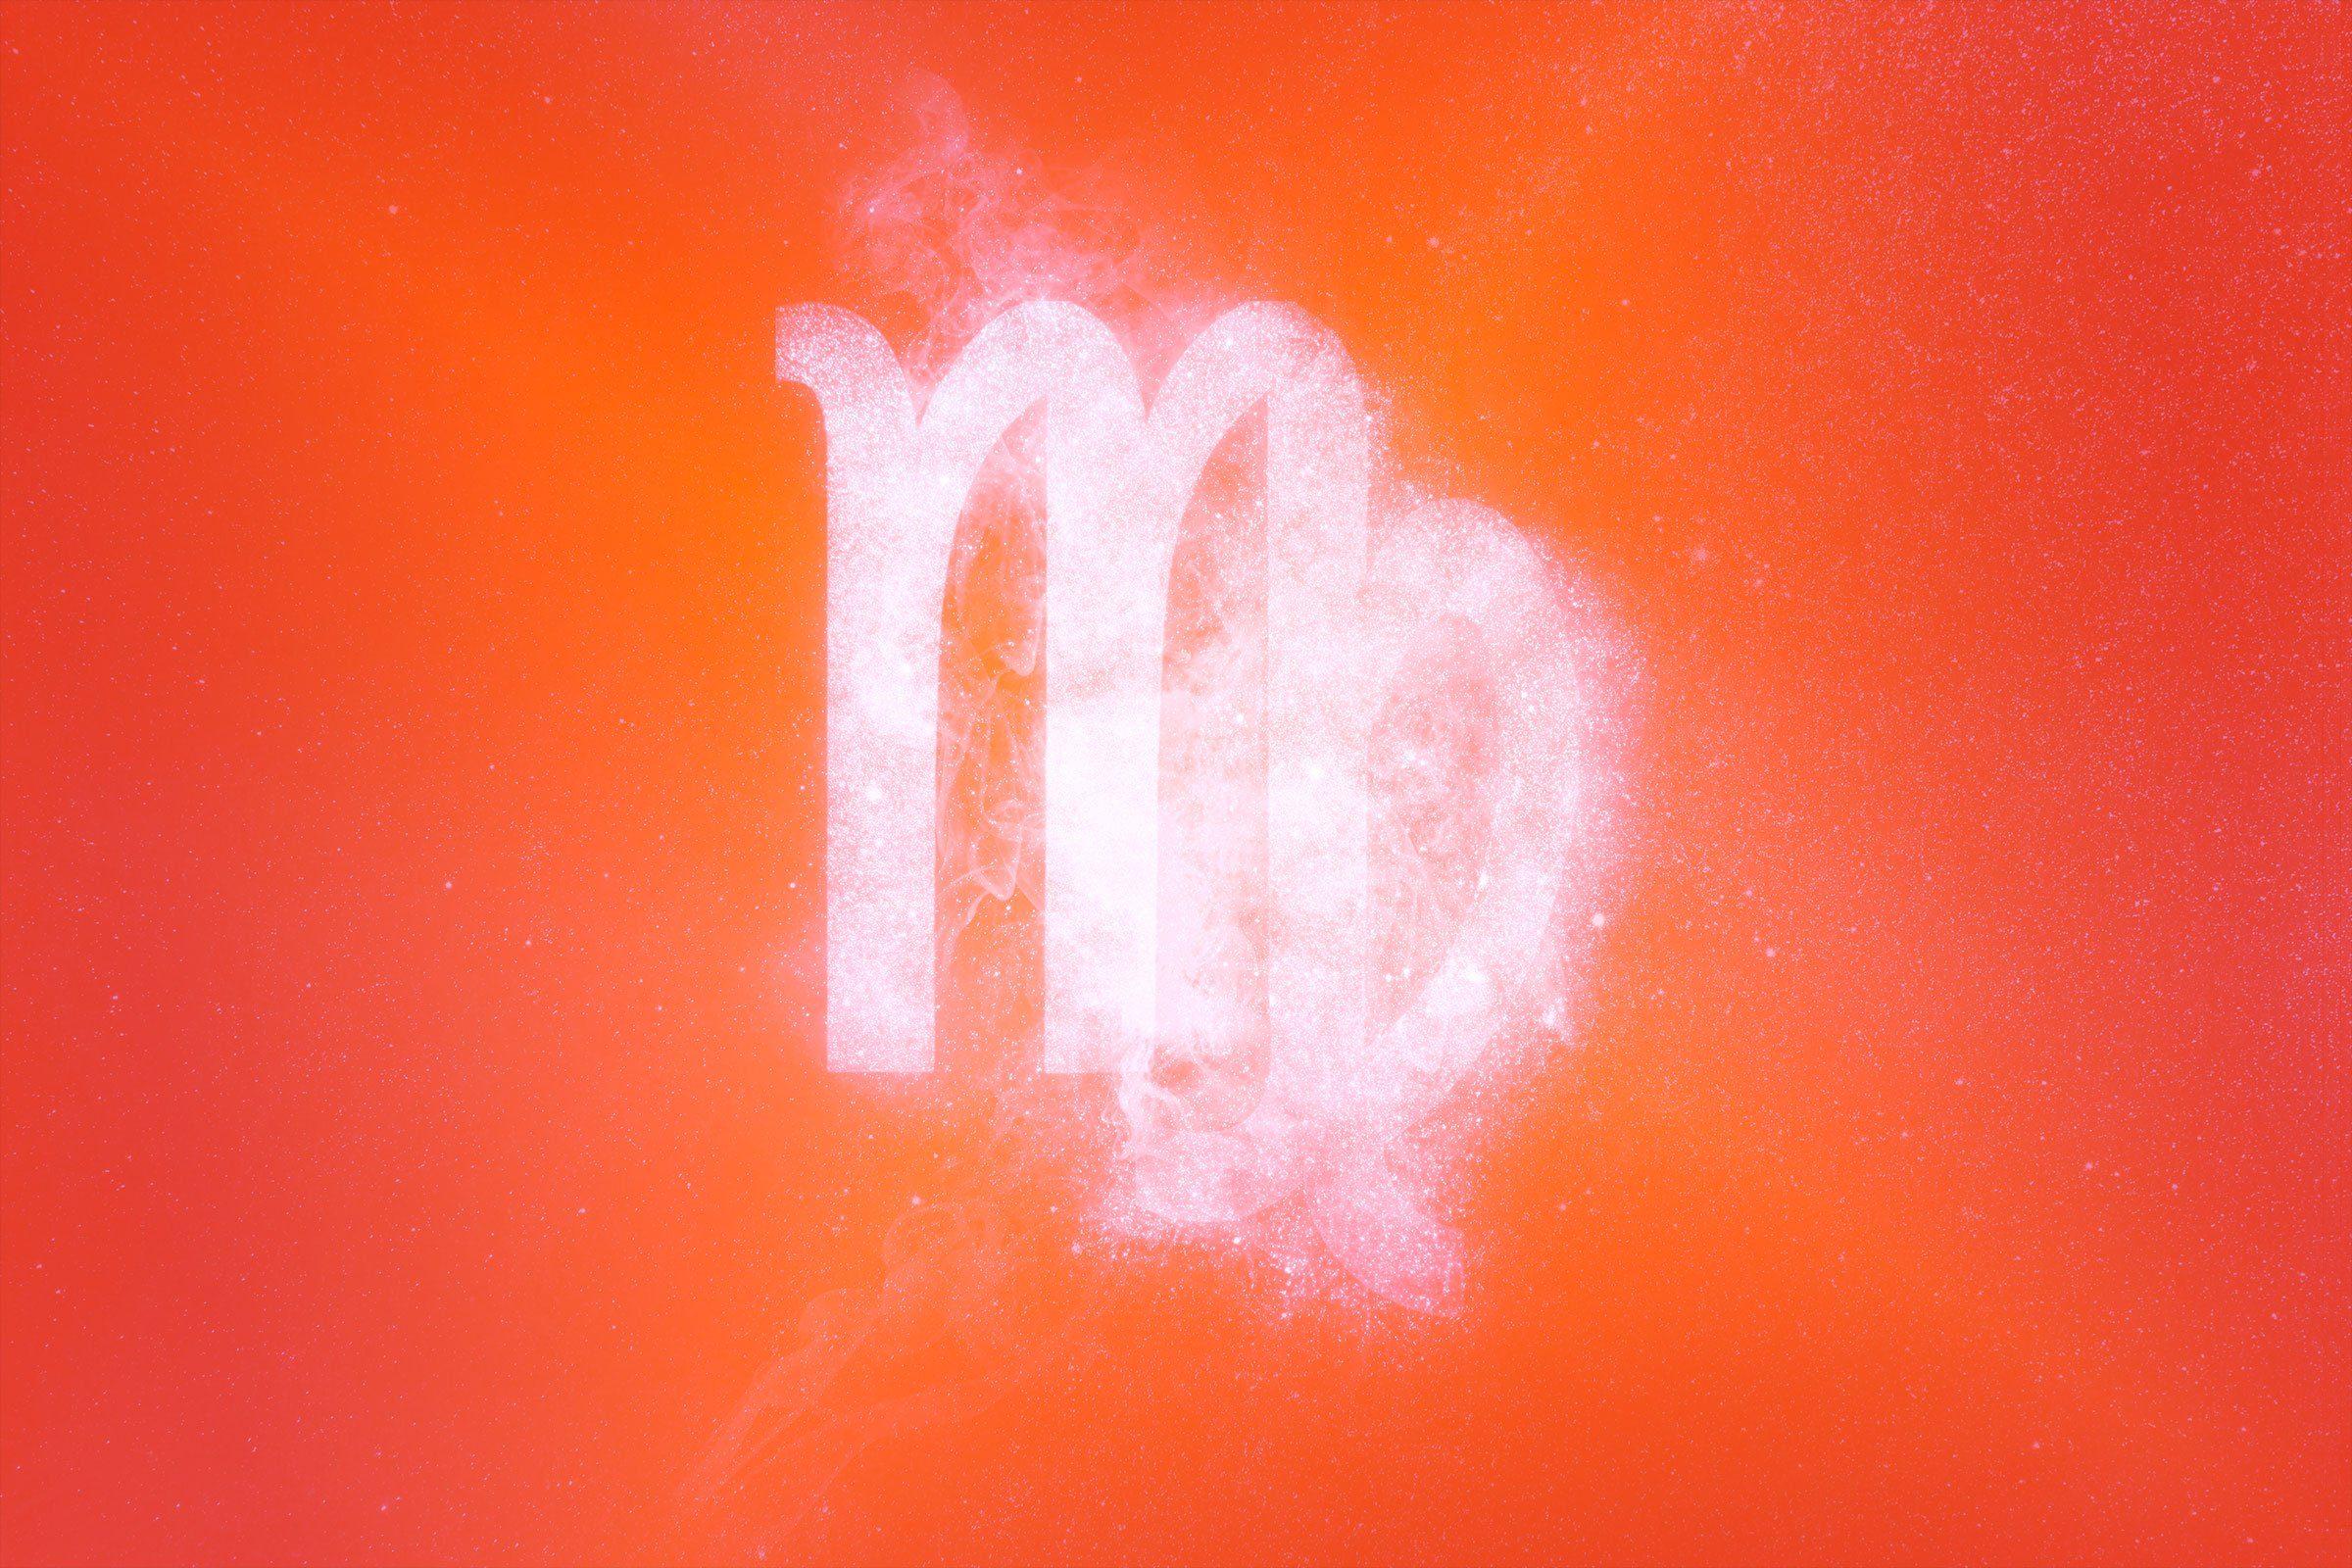 virgo symbol with red-orange gradient overlay